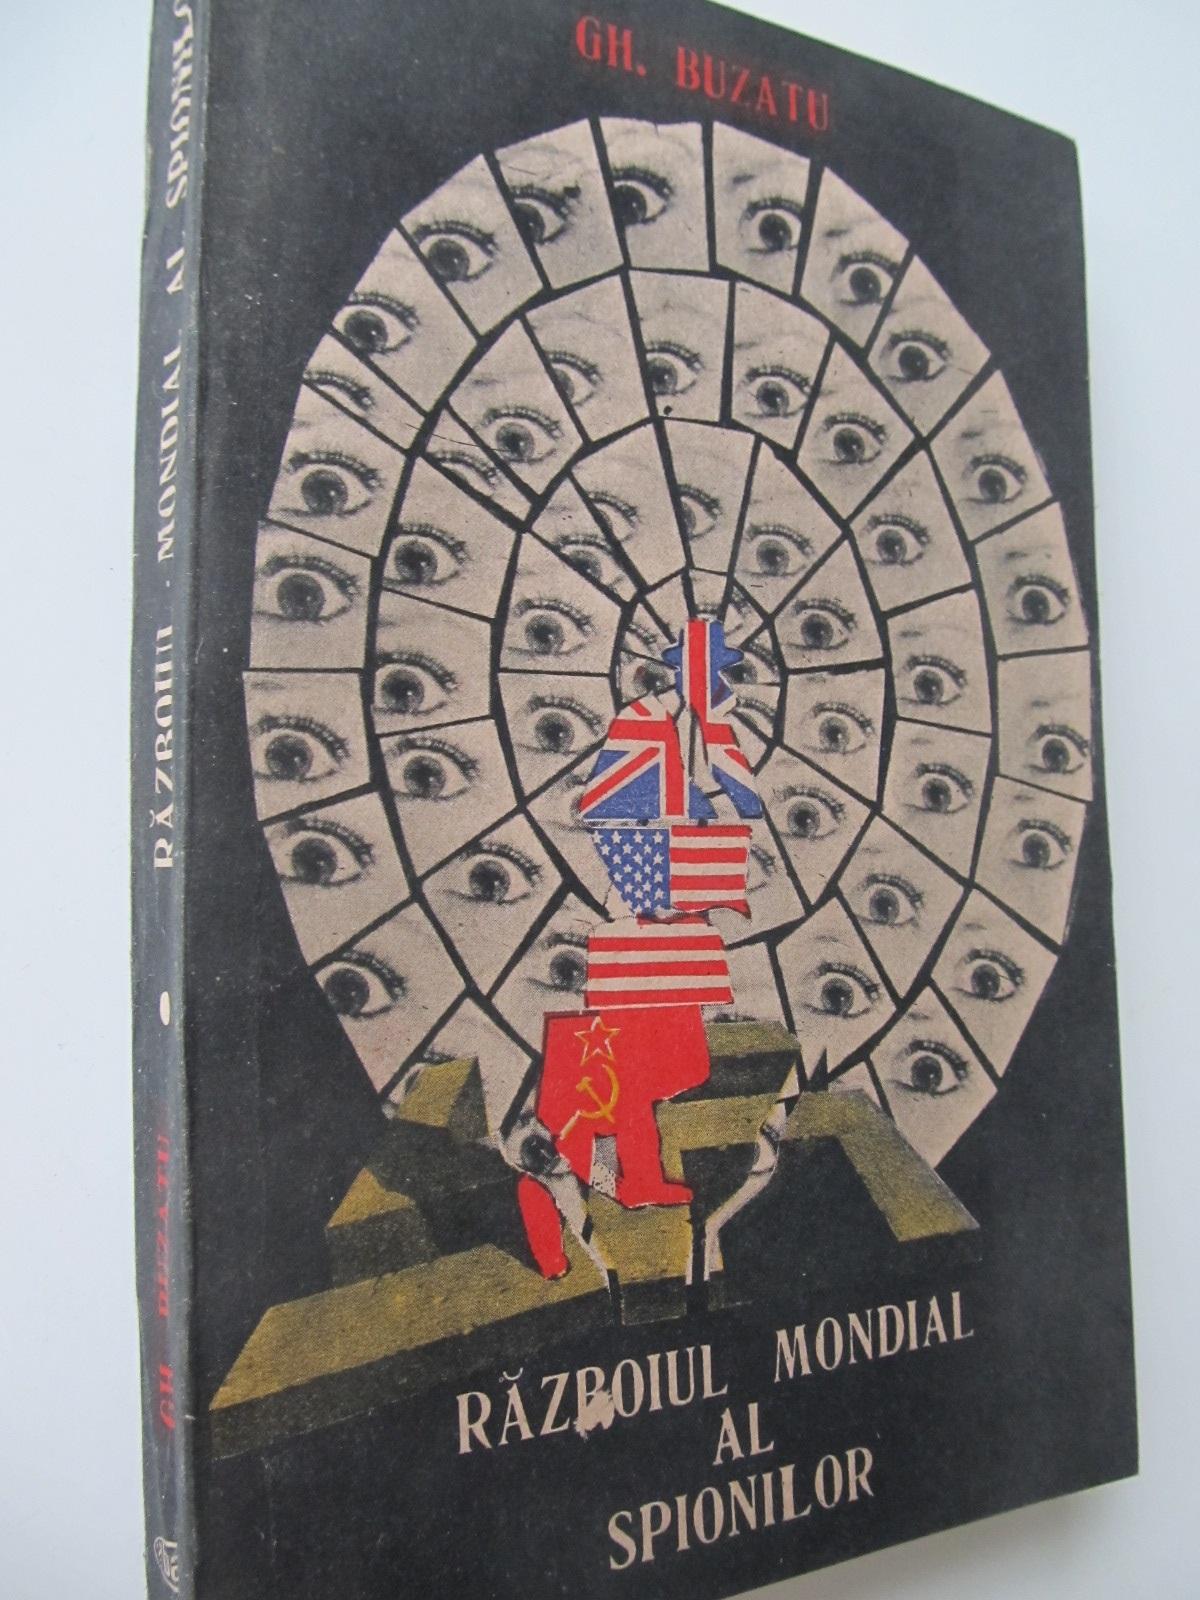 Razboiul mondial al spionilor - Gh. Buzatu   Detalii carte